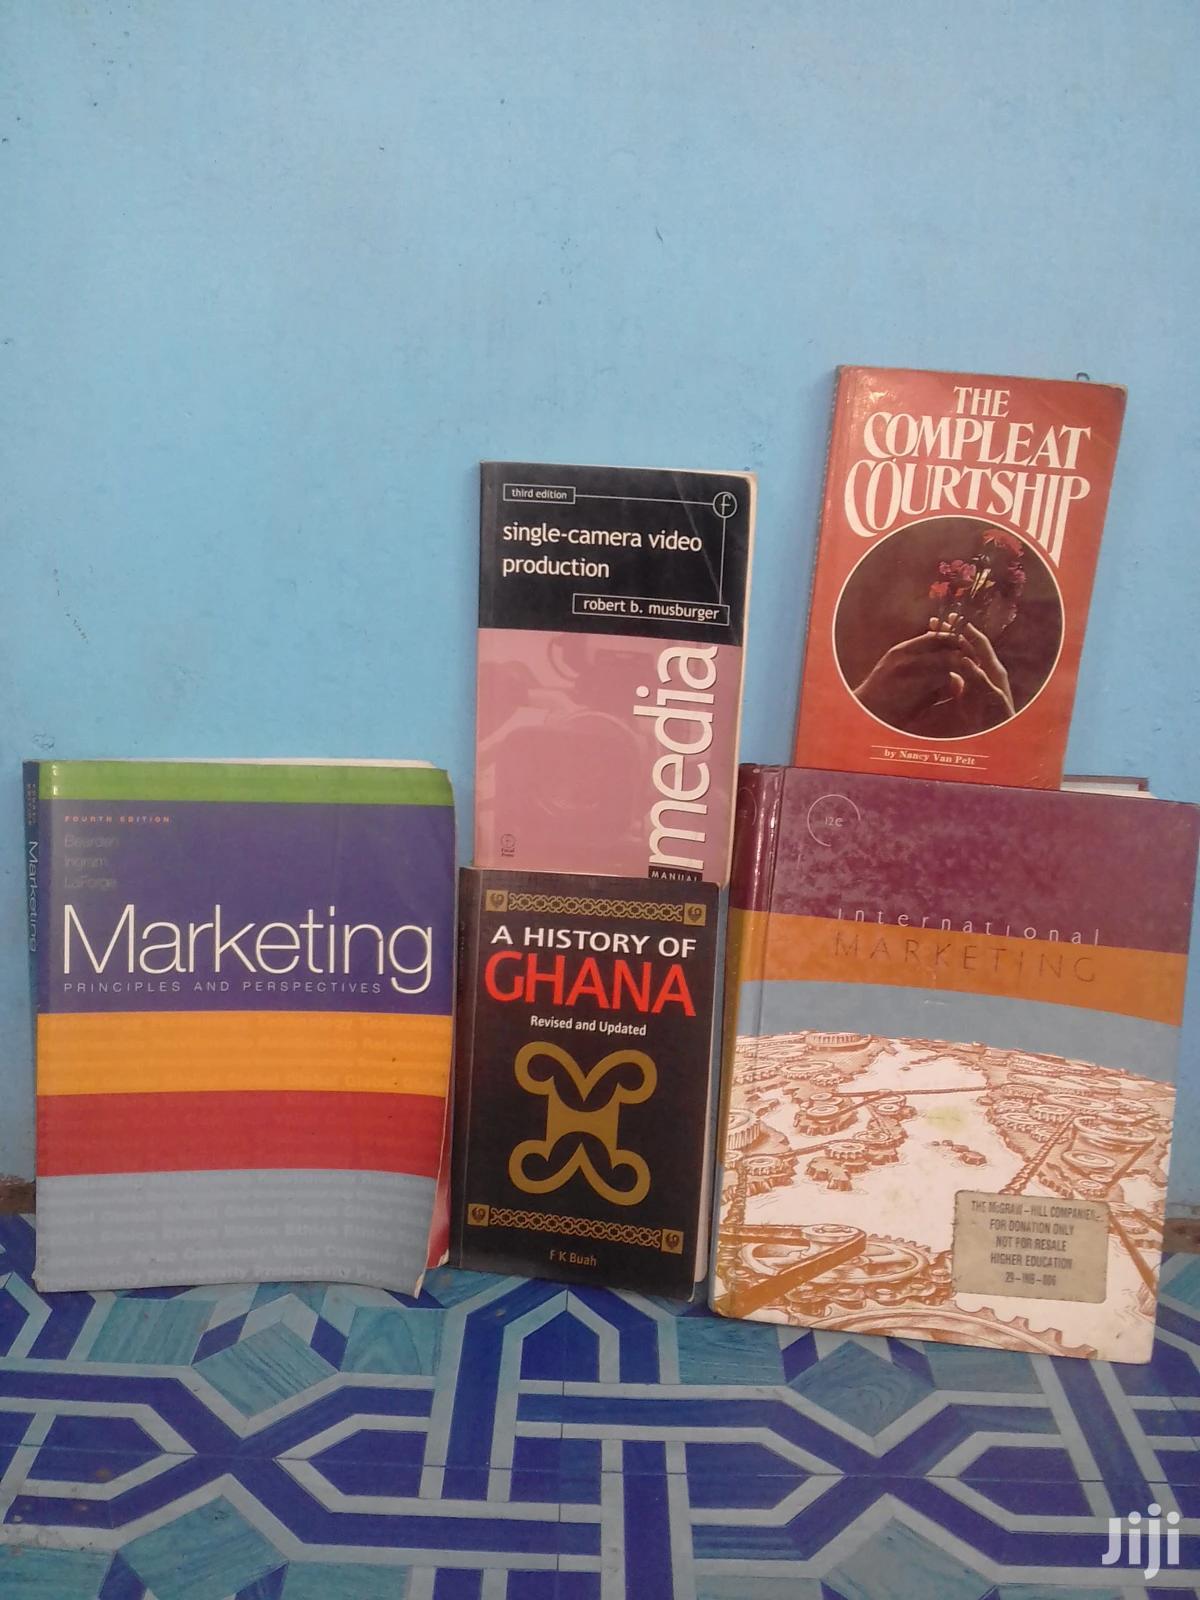 Books On Marketing Etc.